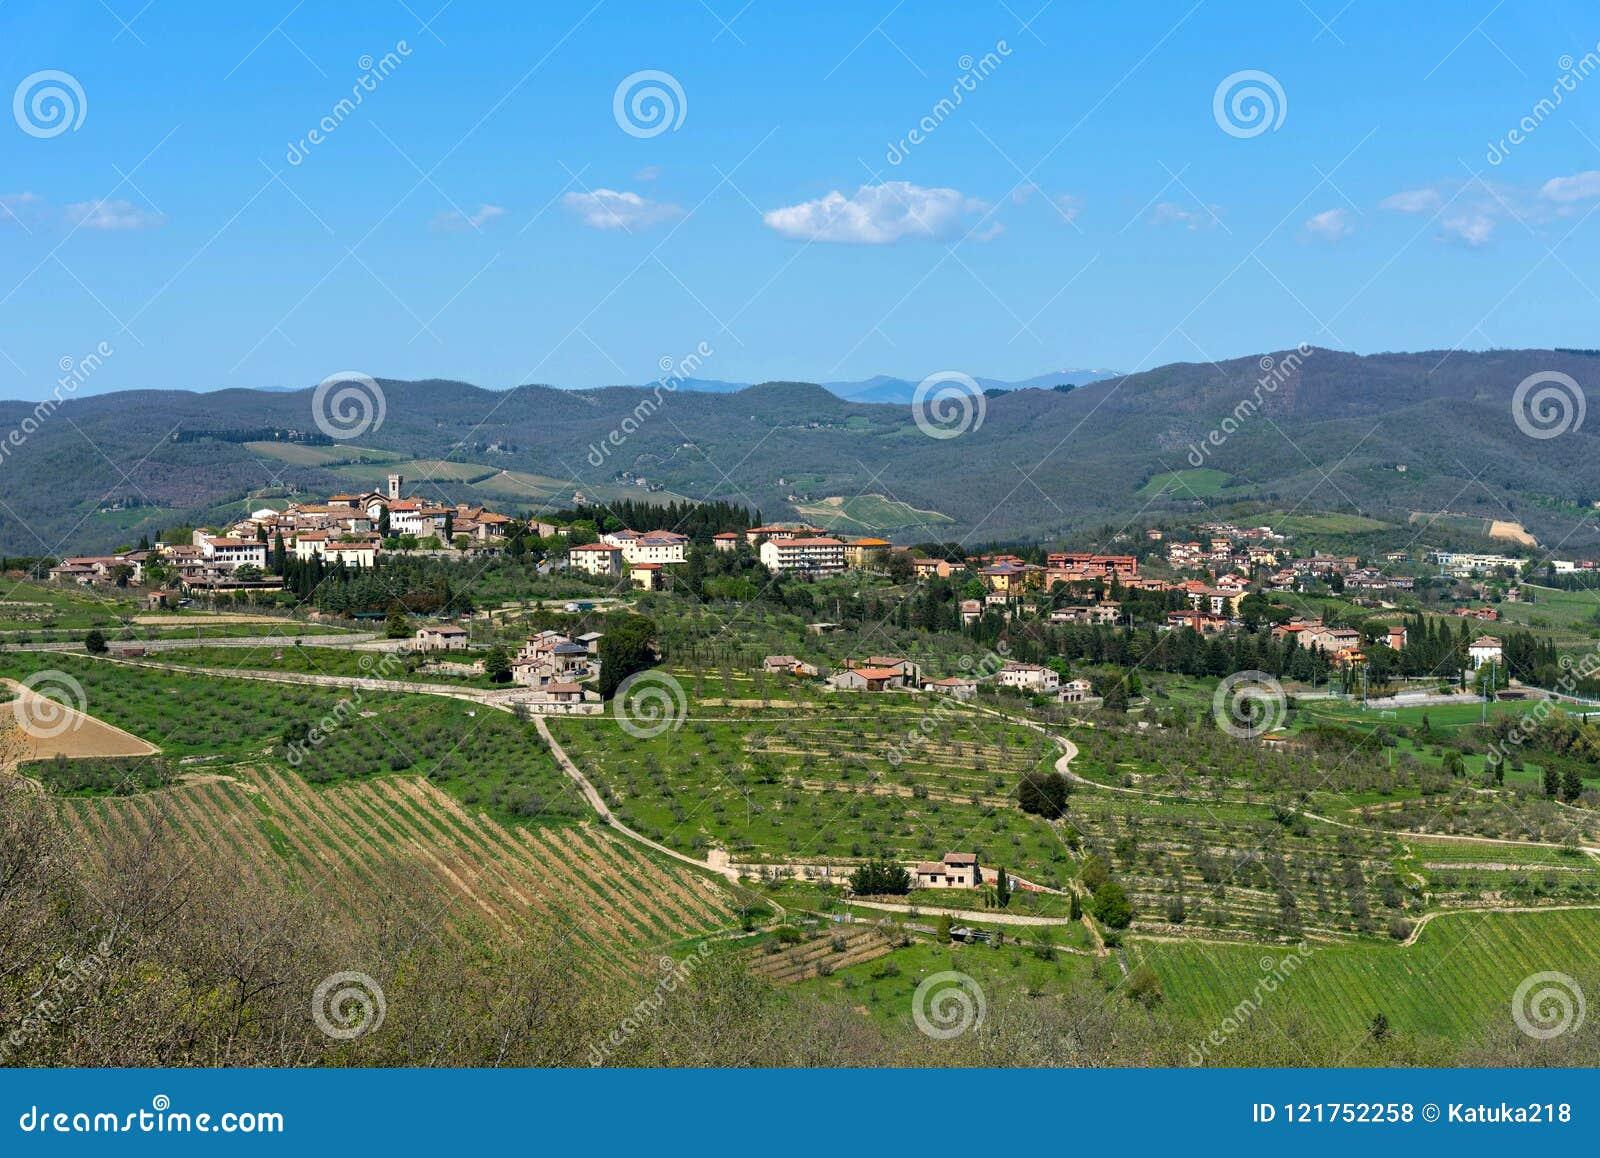 Panoramic beautiful view of Radda in Chianti province of Siena, Tuscany, Italy.